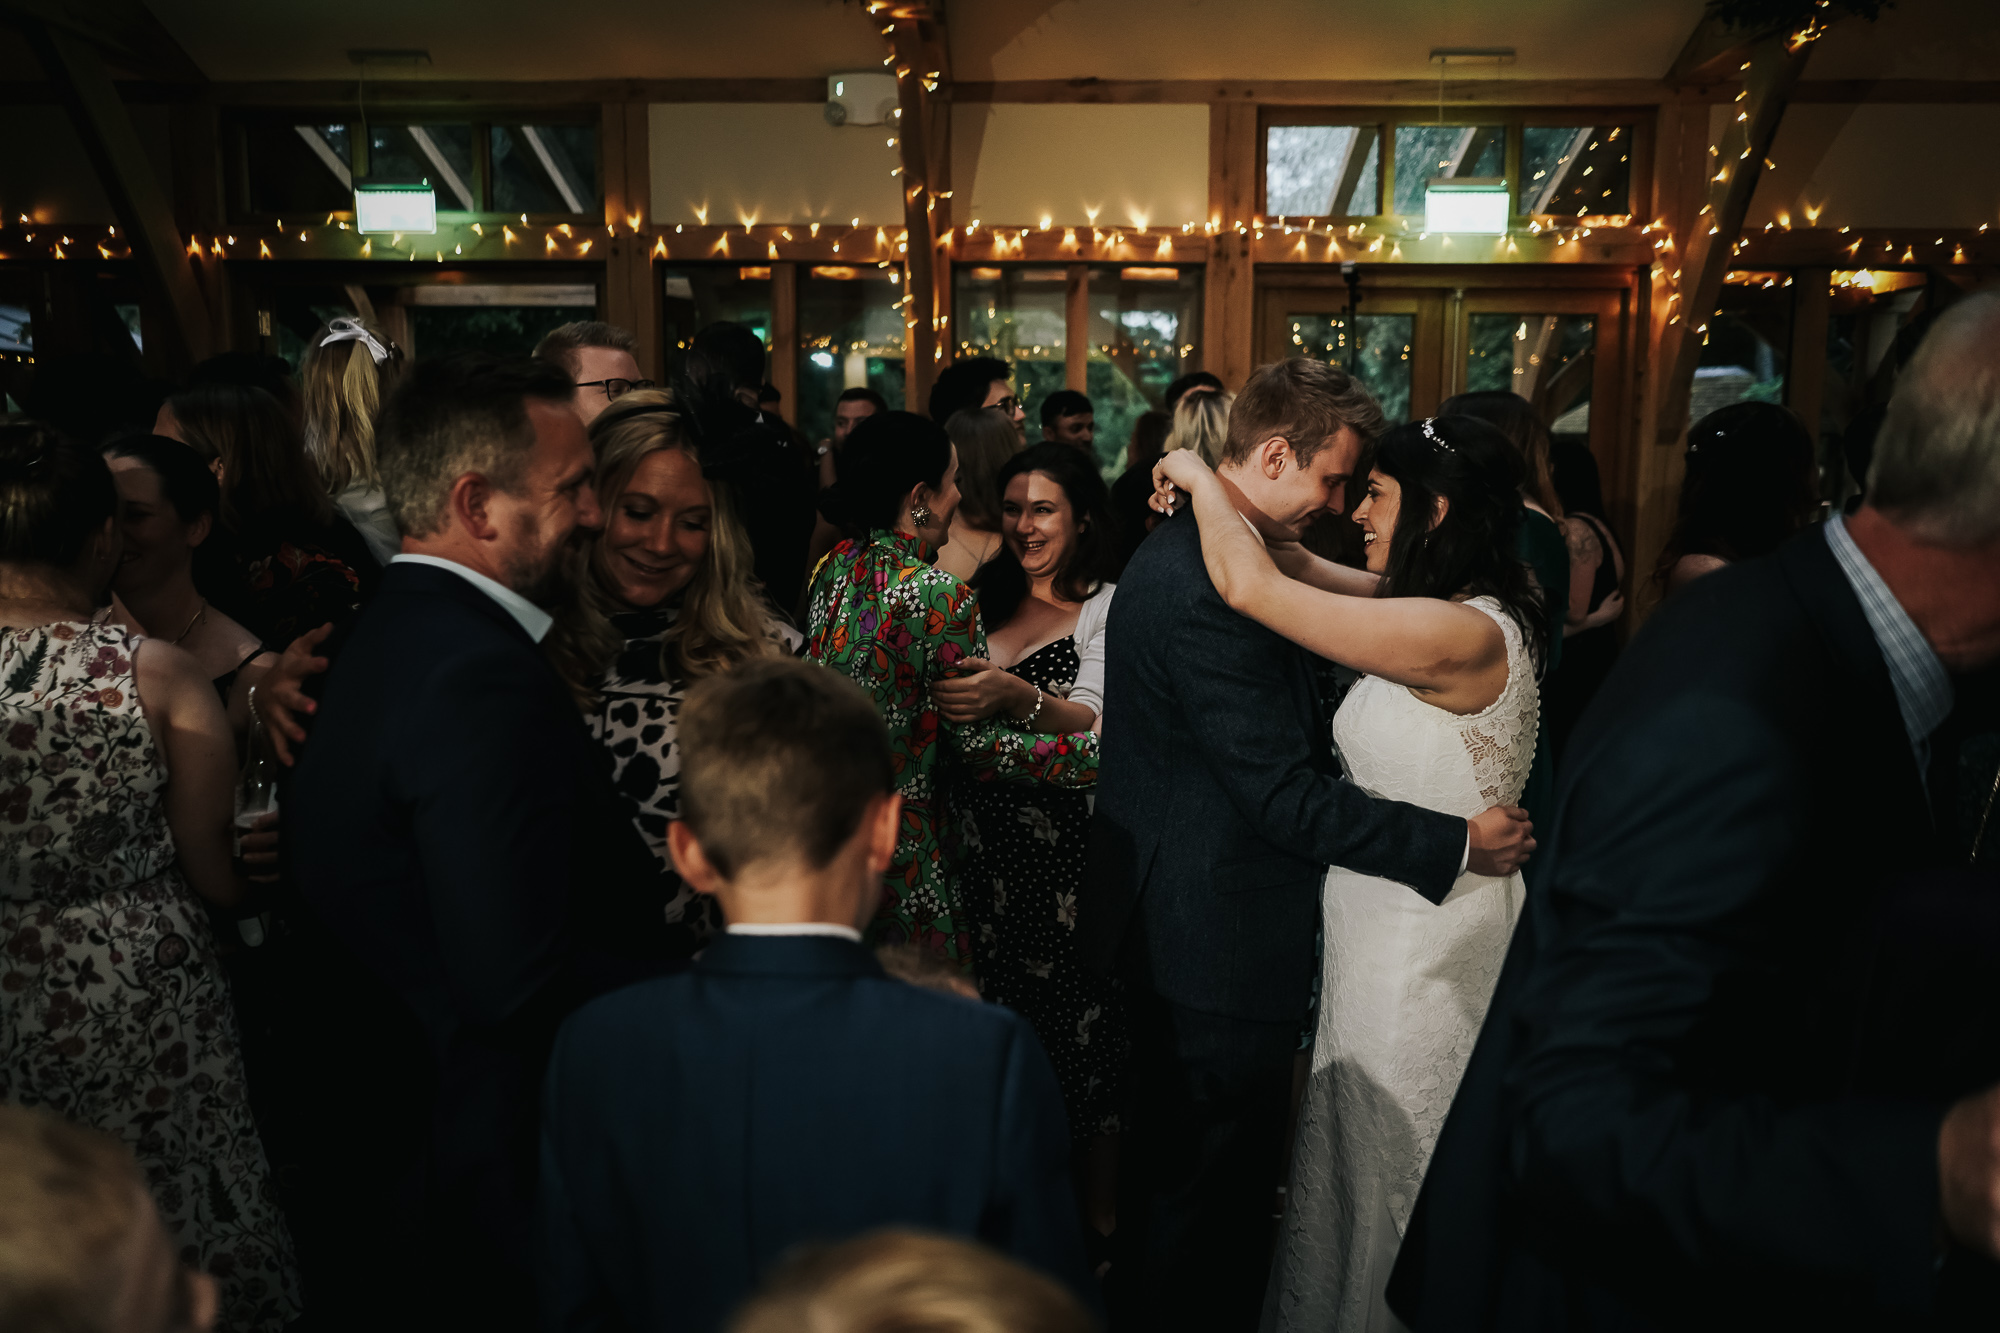 Oak tree of peover wedding photography cheshire wedding photographer (54 of 56).jpg